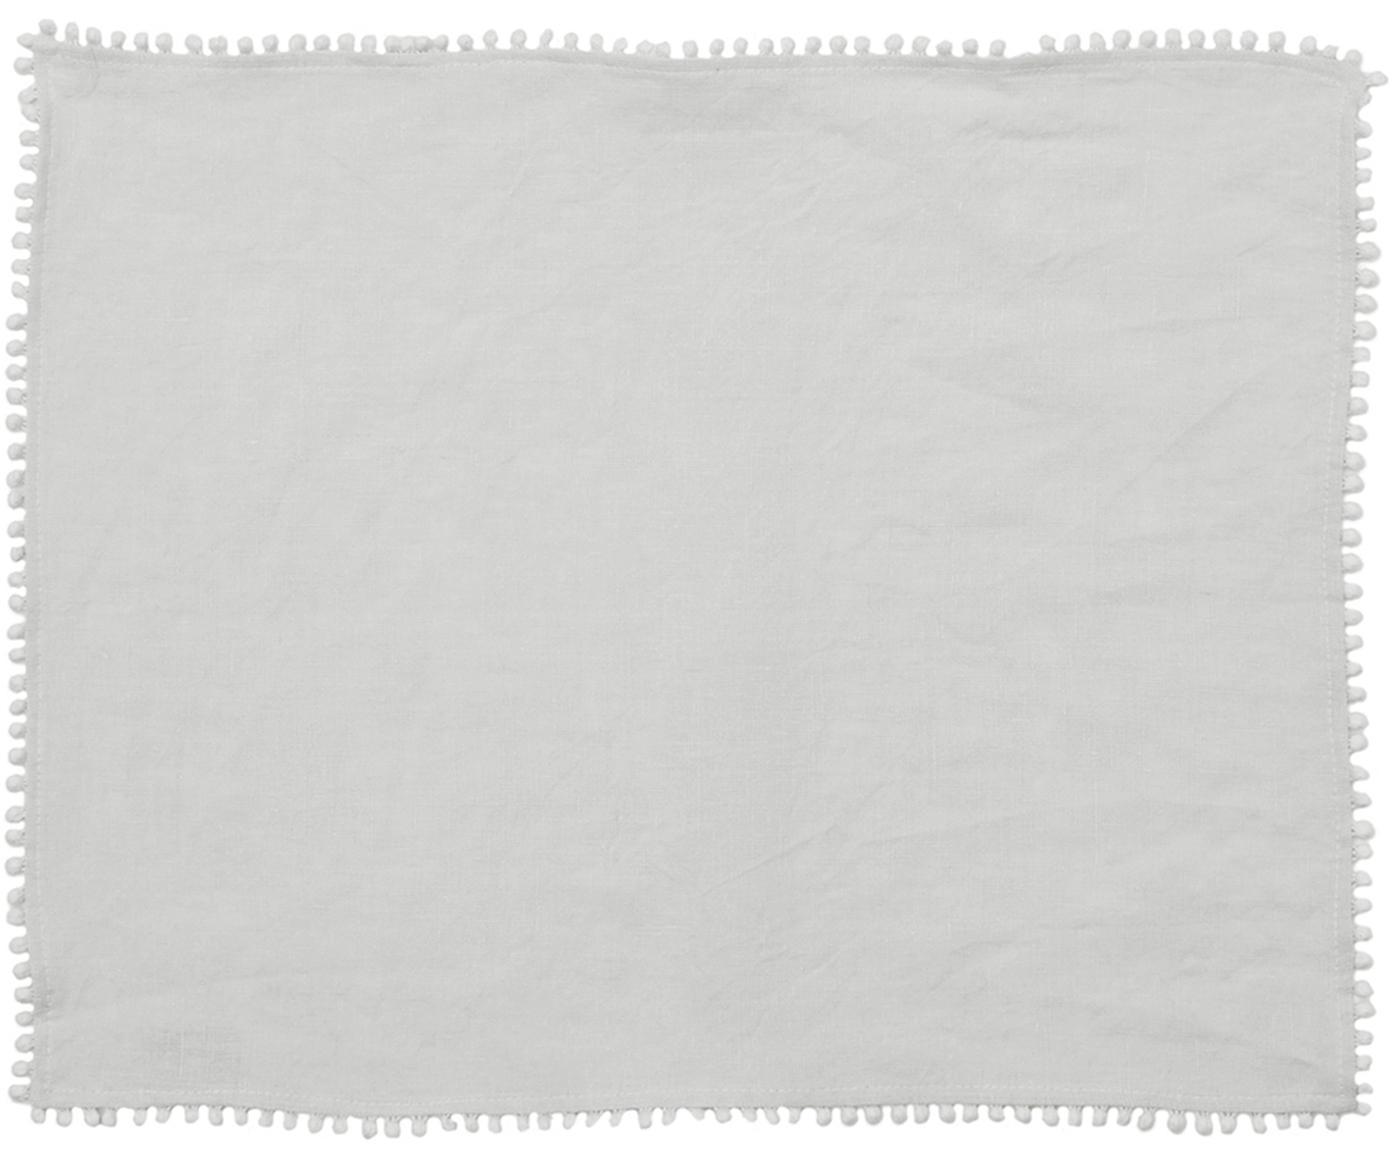 Linnen placemats Pom Pom, 2 stuks, Linnen, Lichtgrijs, 35 x 45 cm